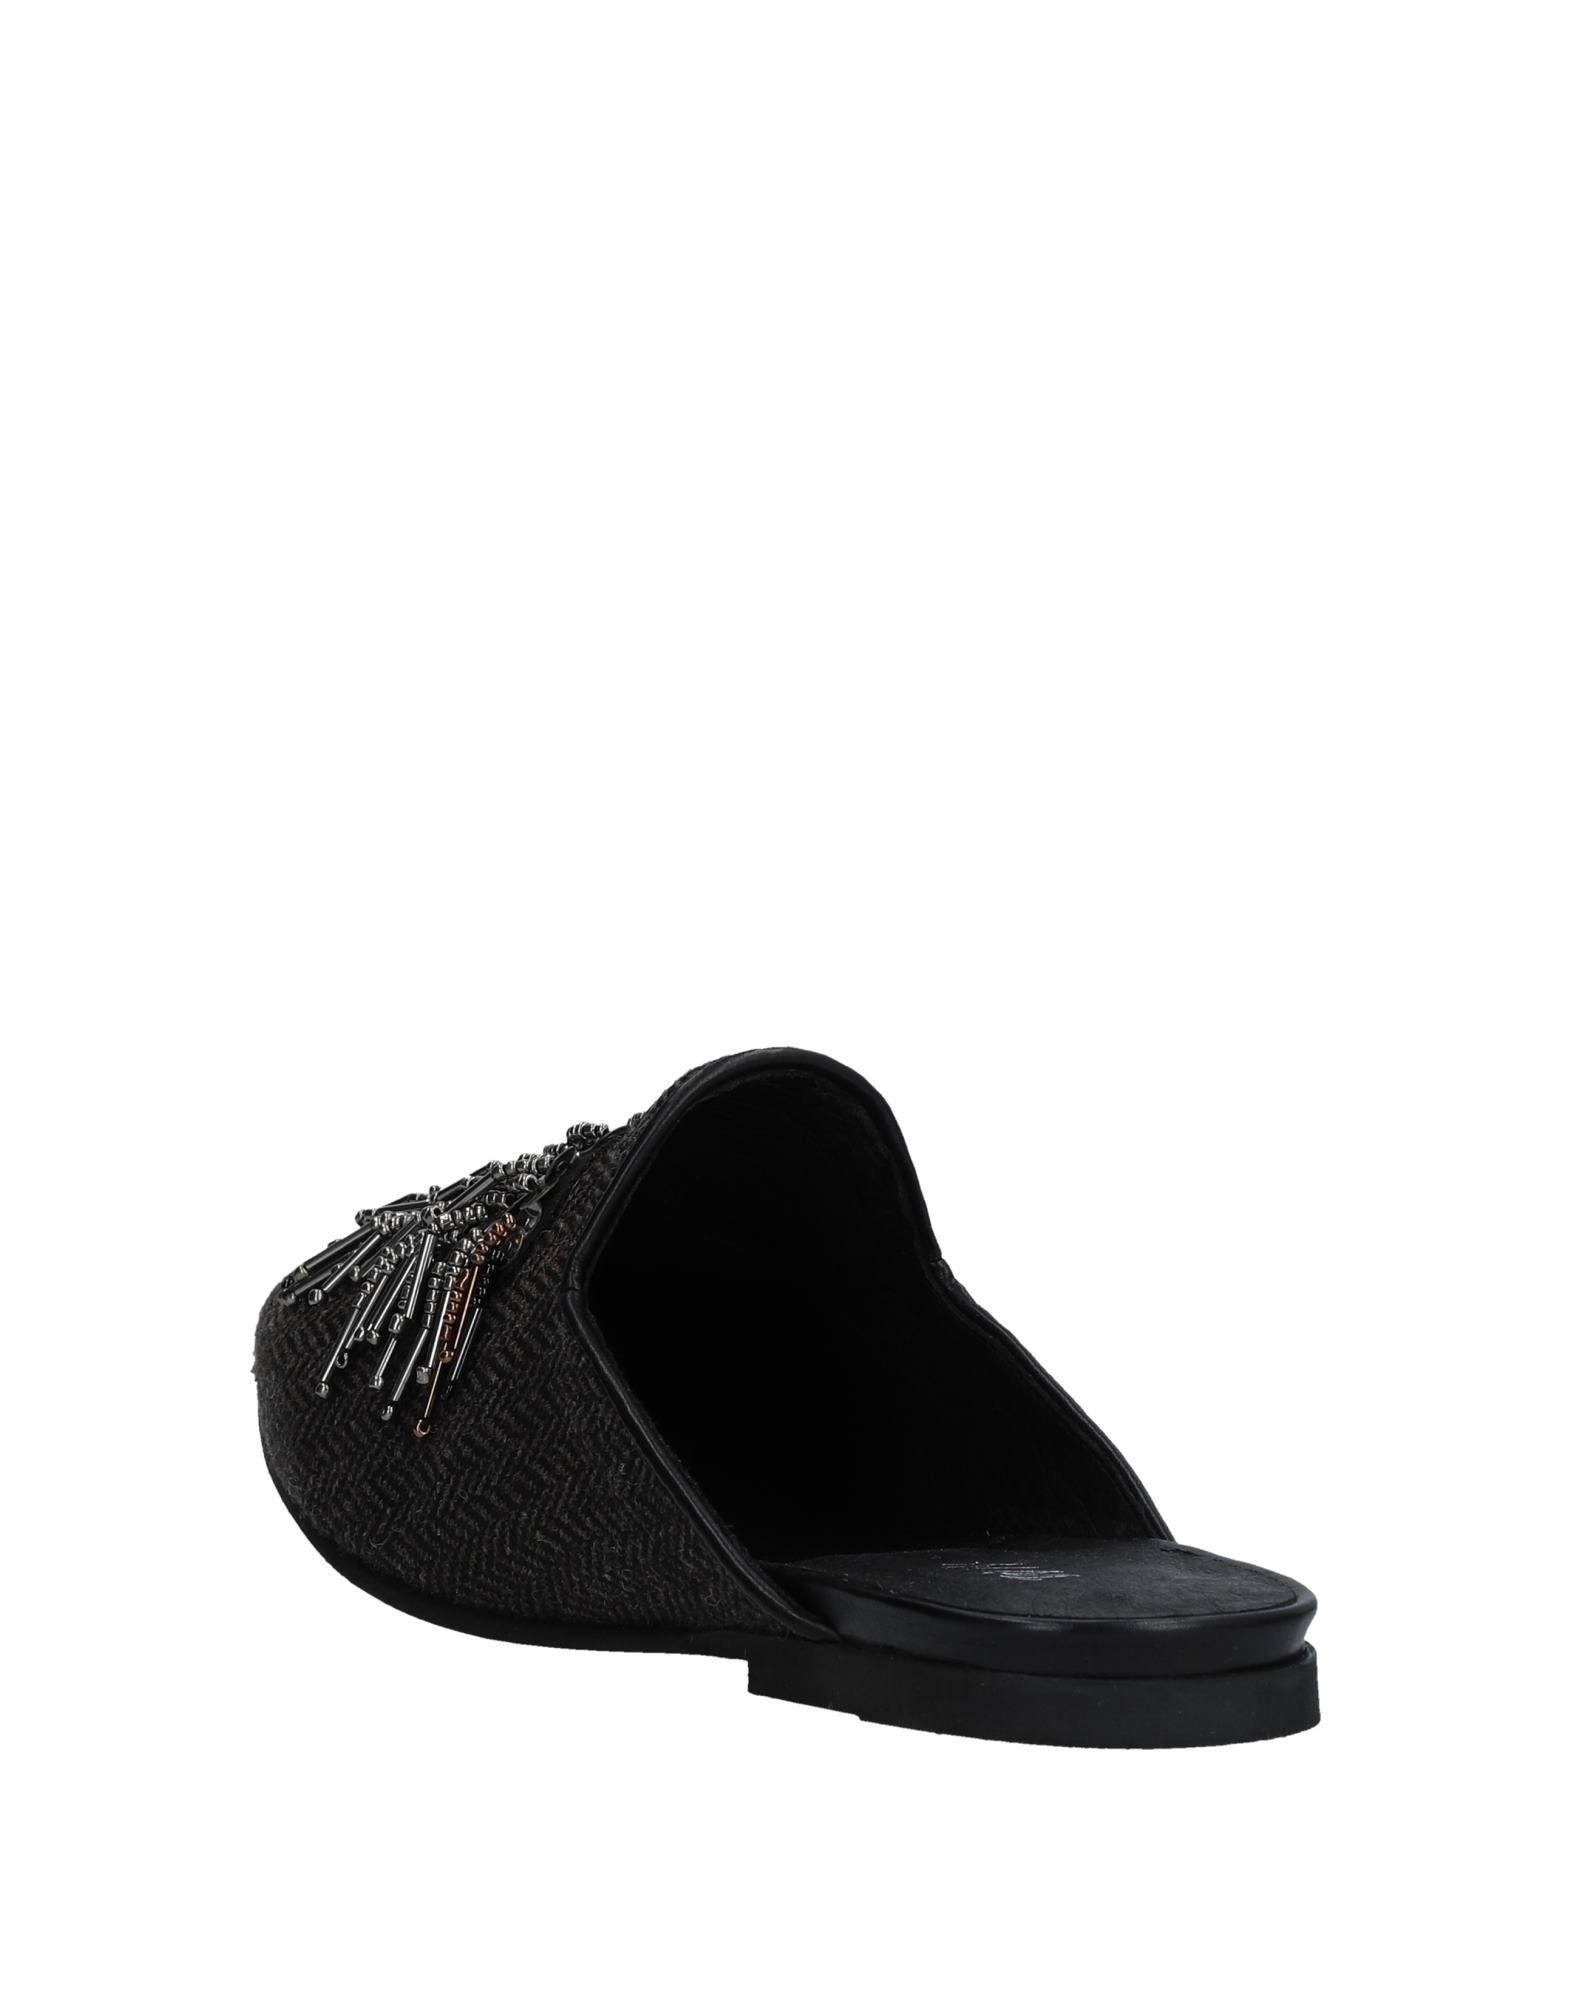 Via Vela 14 Pantoletten Schuhe Damen  11542712AP Neue Schuhe Pantoletten 9f60bd